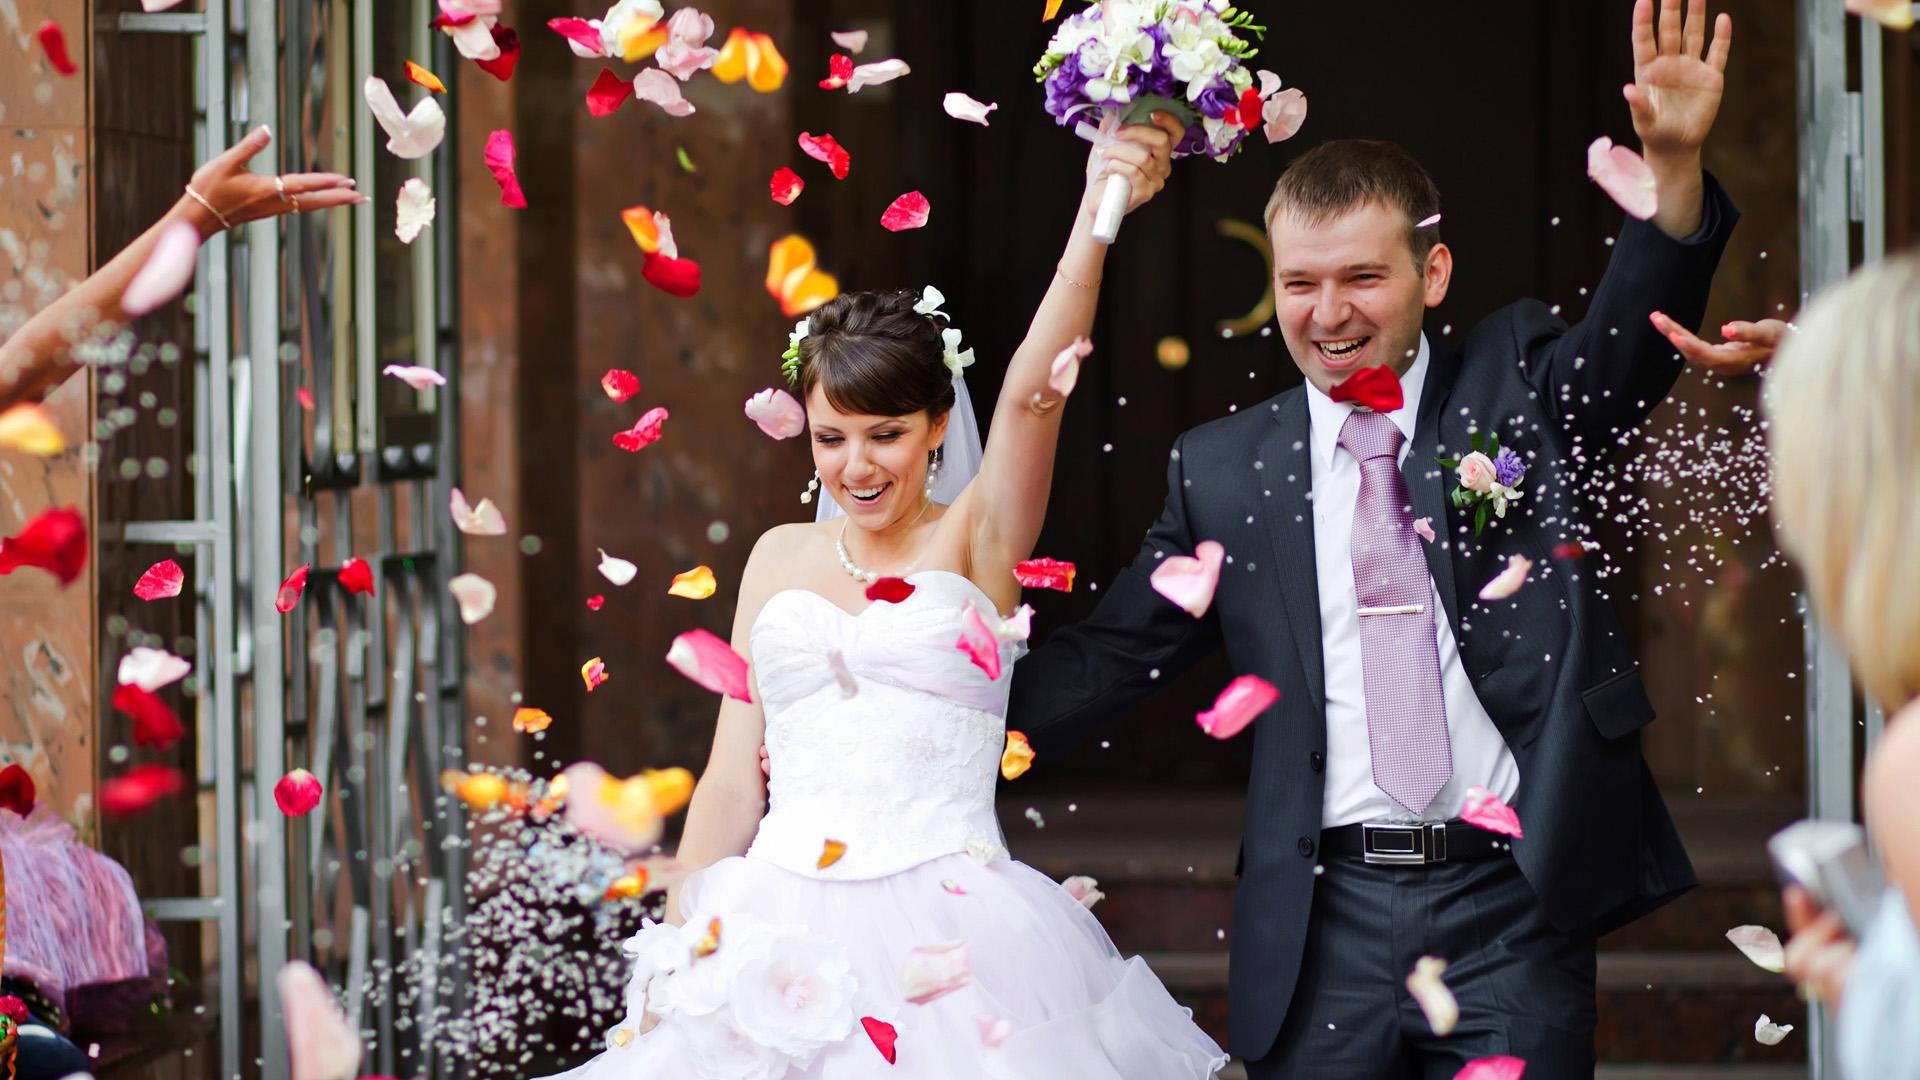 C Evlilik 1 (6)